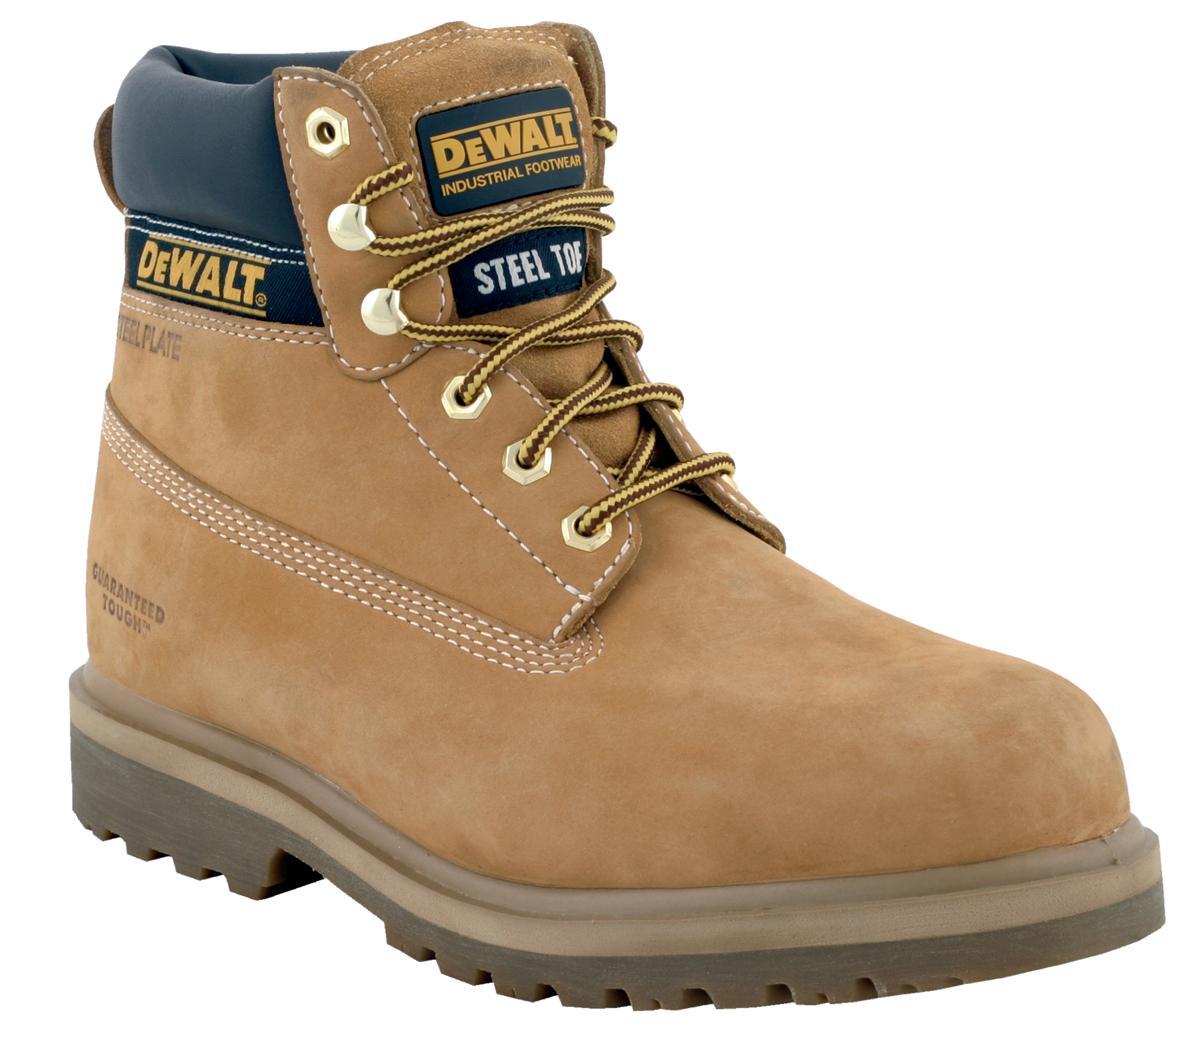 Dewalt Safety Boots 6 inch Nubuck Steel-midsole Chemical-resistant Size 7 Wheat Ref Explorer 7